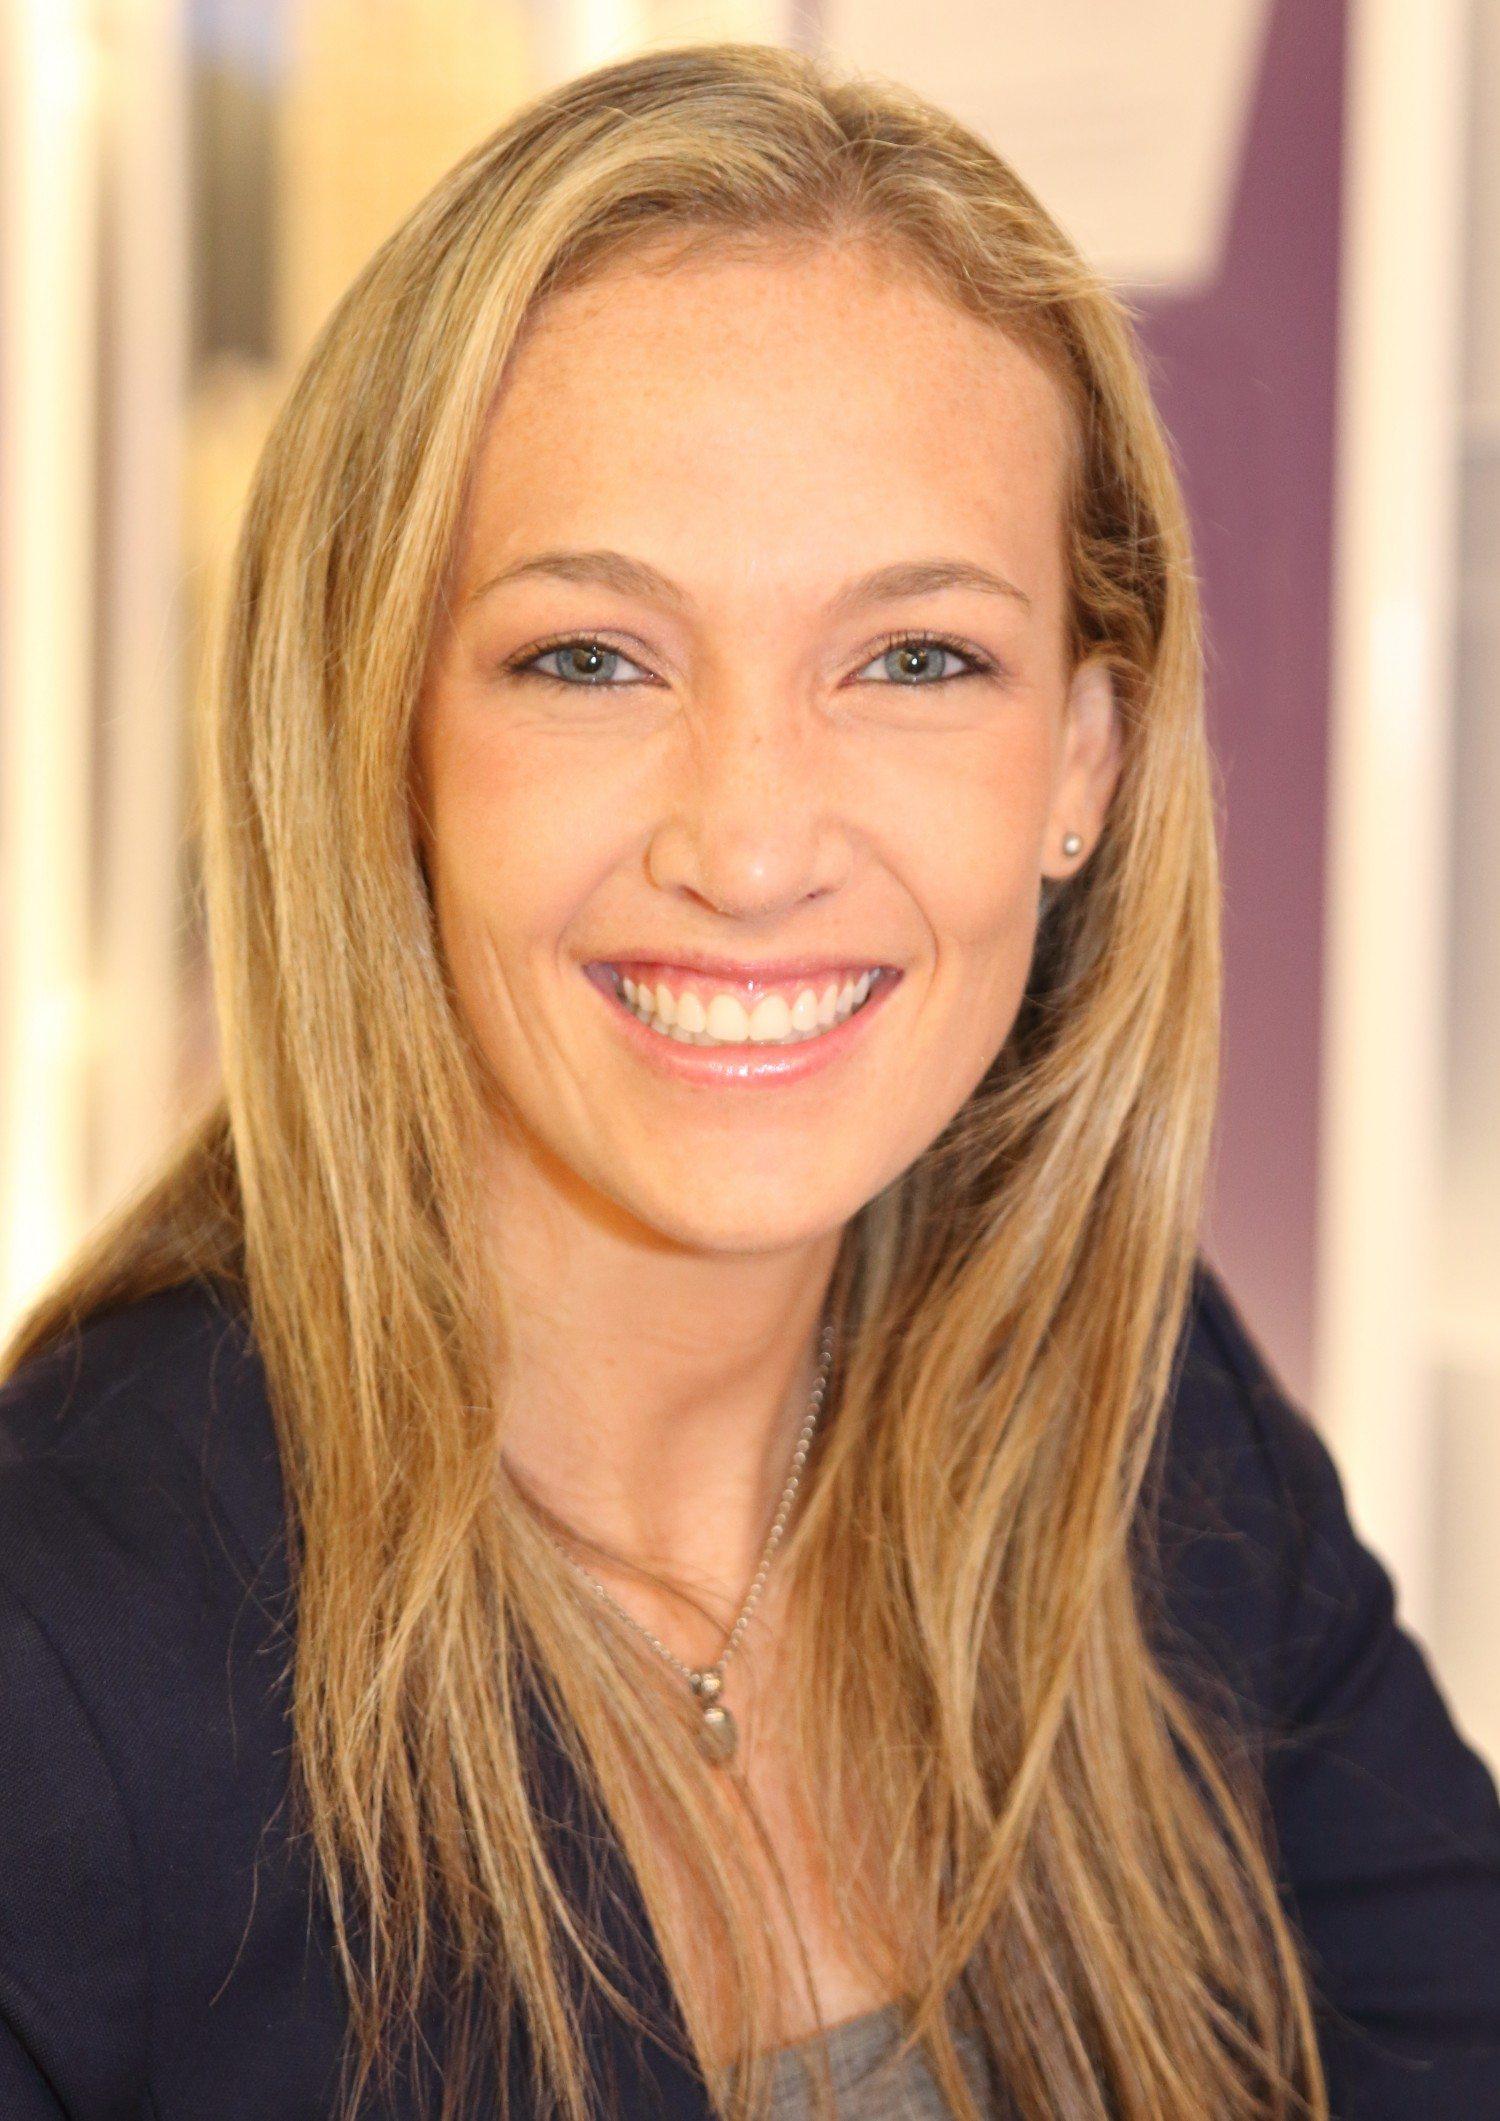 Sarah Lipton